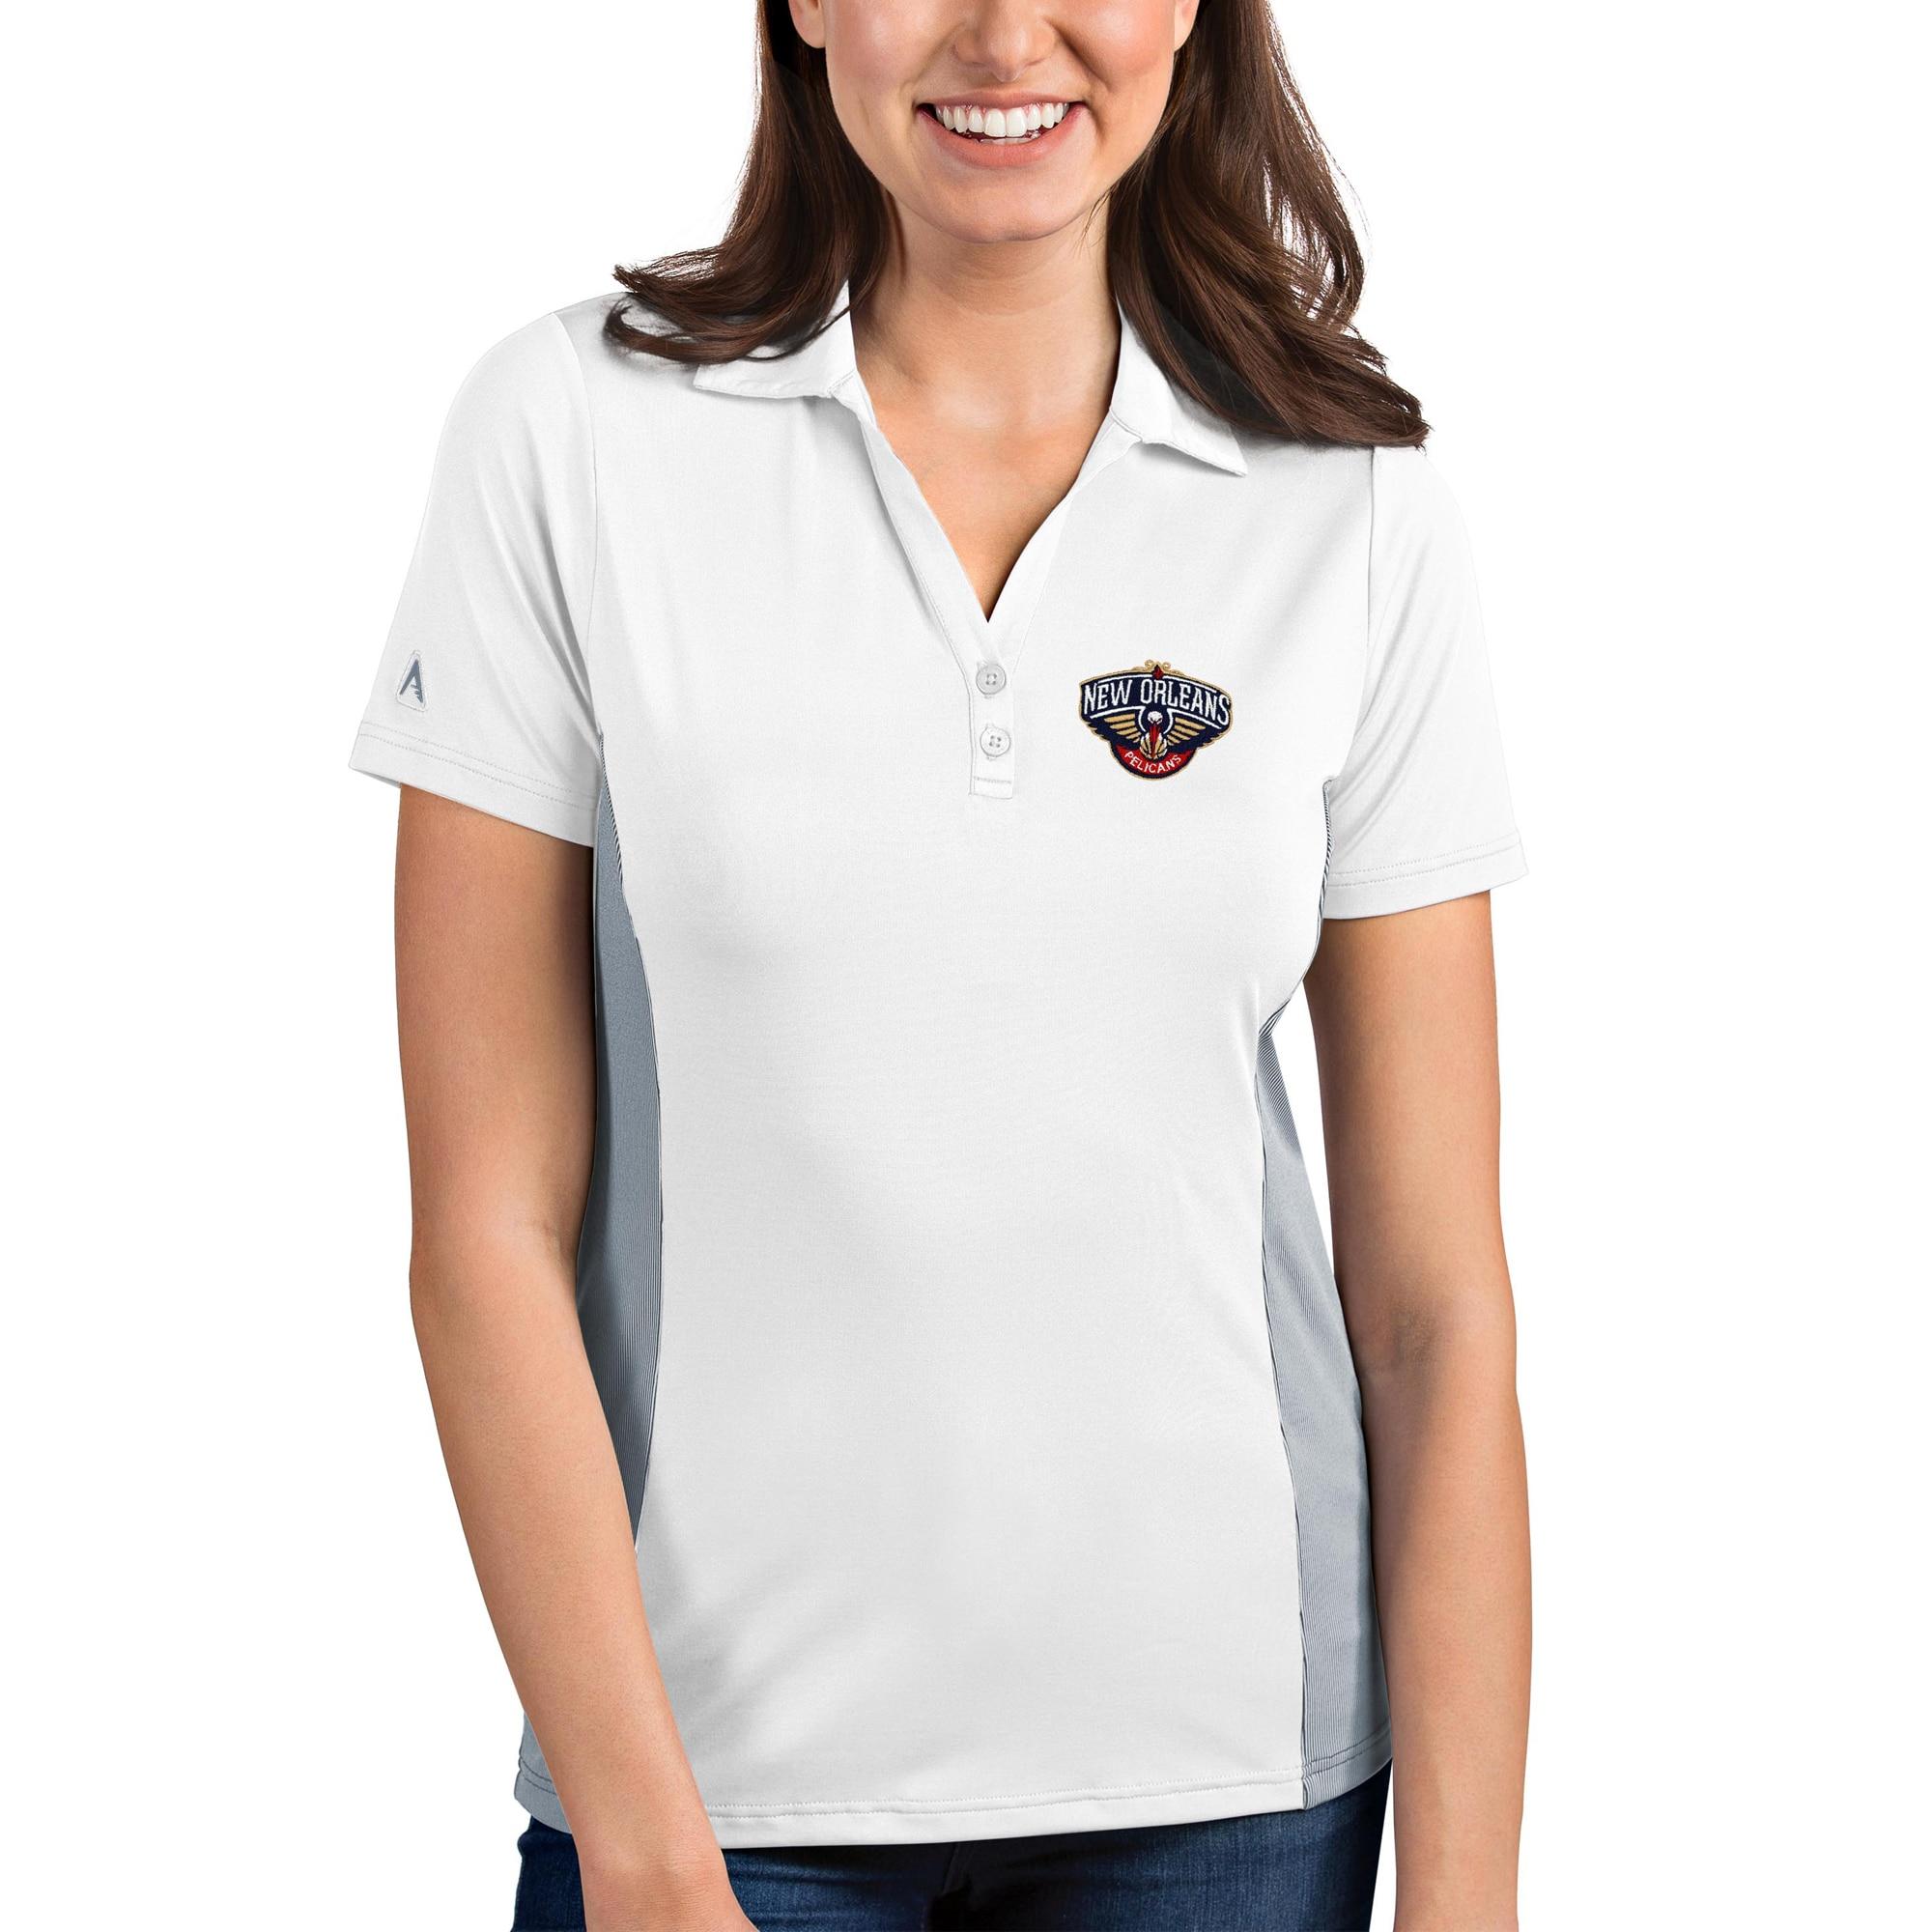 New Orleans Pelicans Antigua Women's Venture Polo - White/Gray